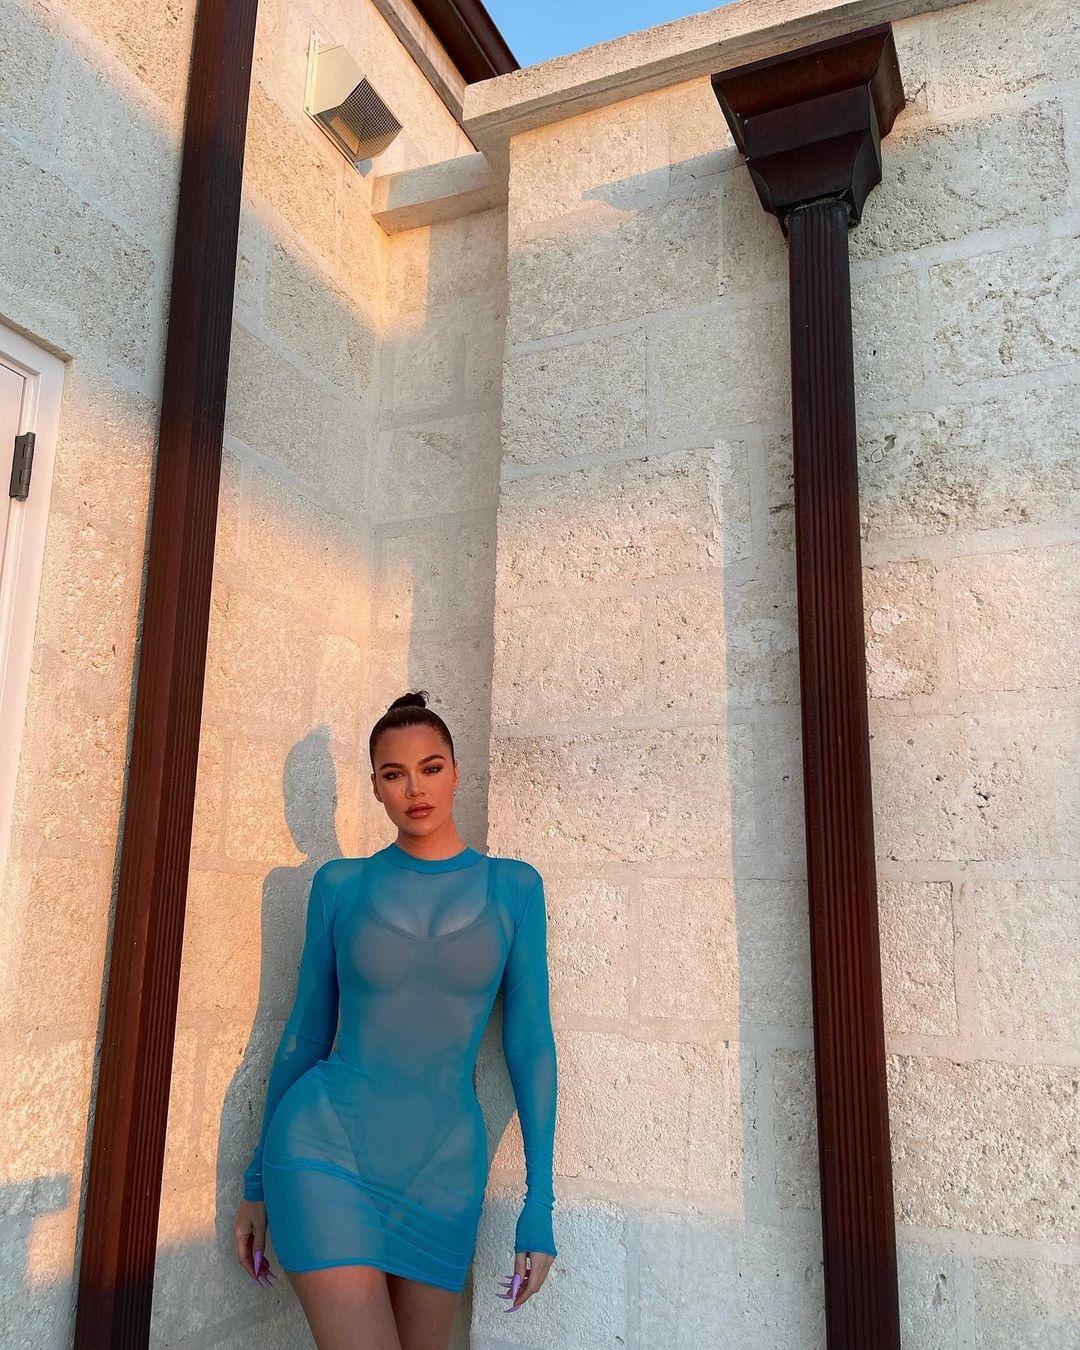 Kylie Jenner, Stormi Webster, Khloe Kardashian, Kim Kardashian Turks & Caicos Trip